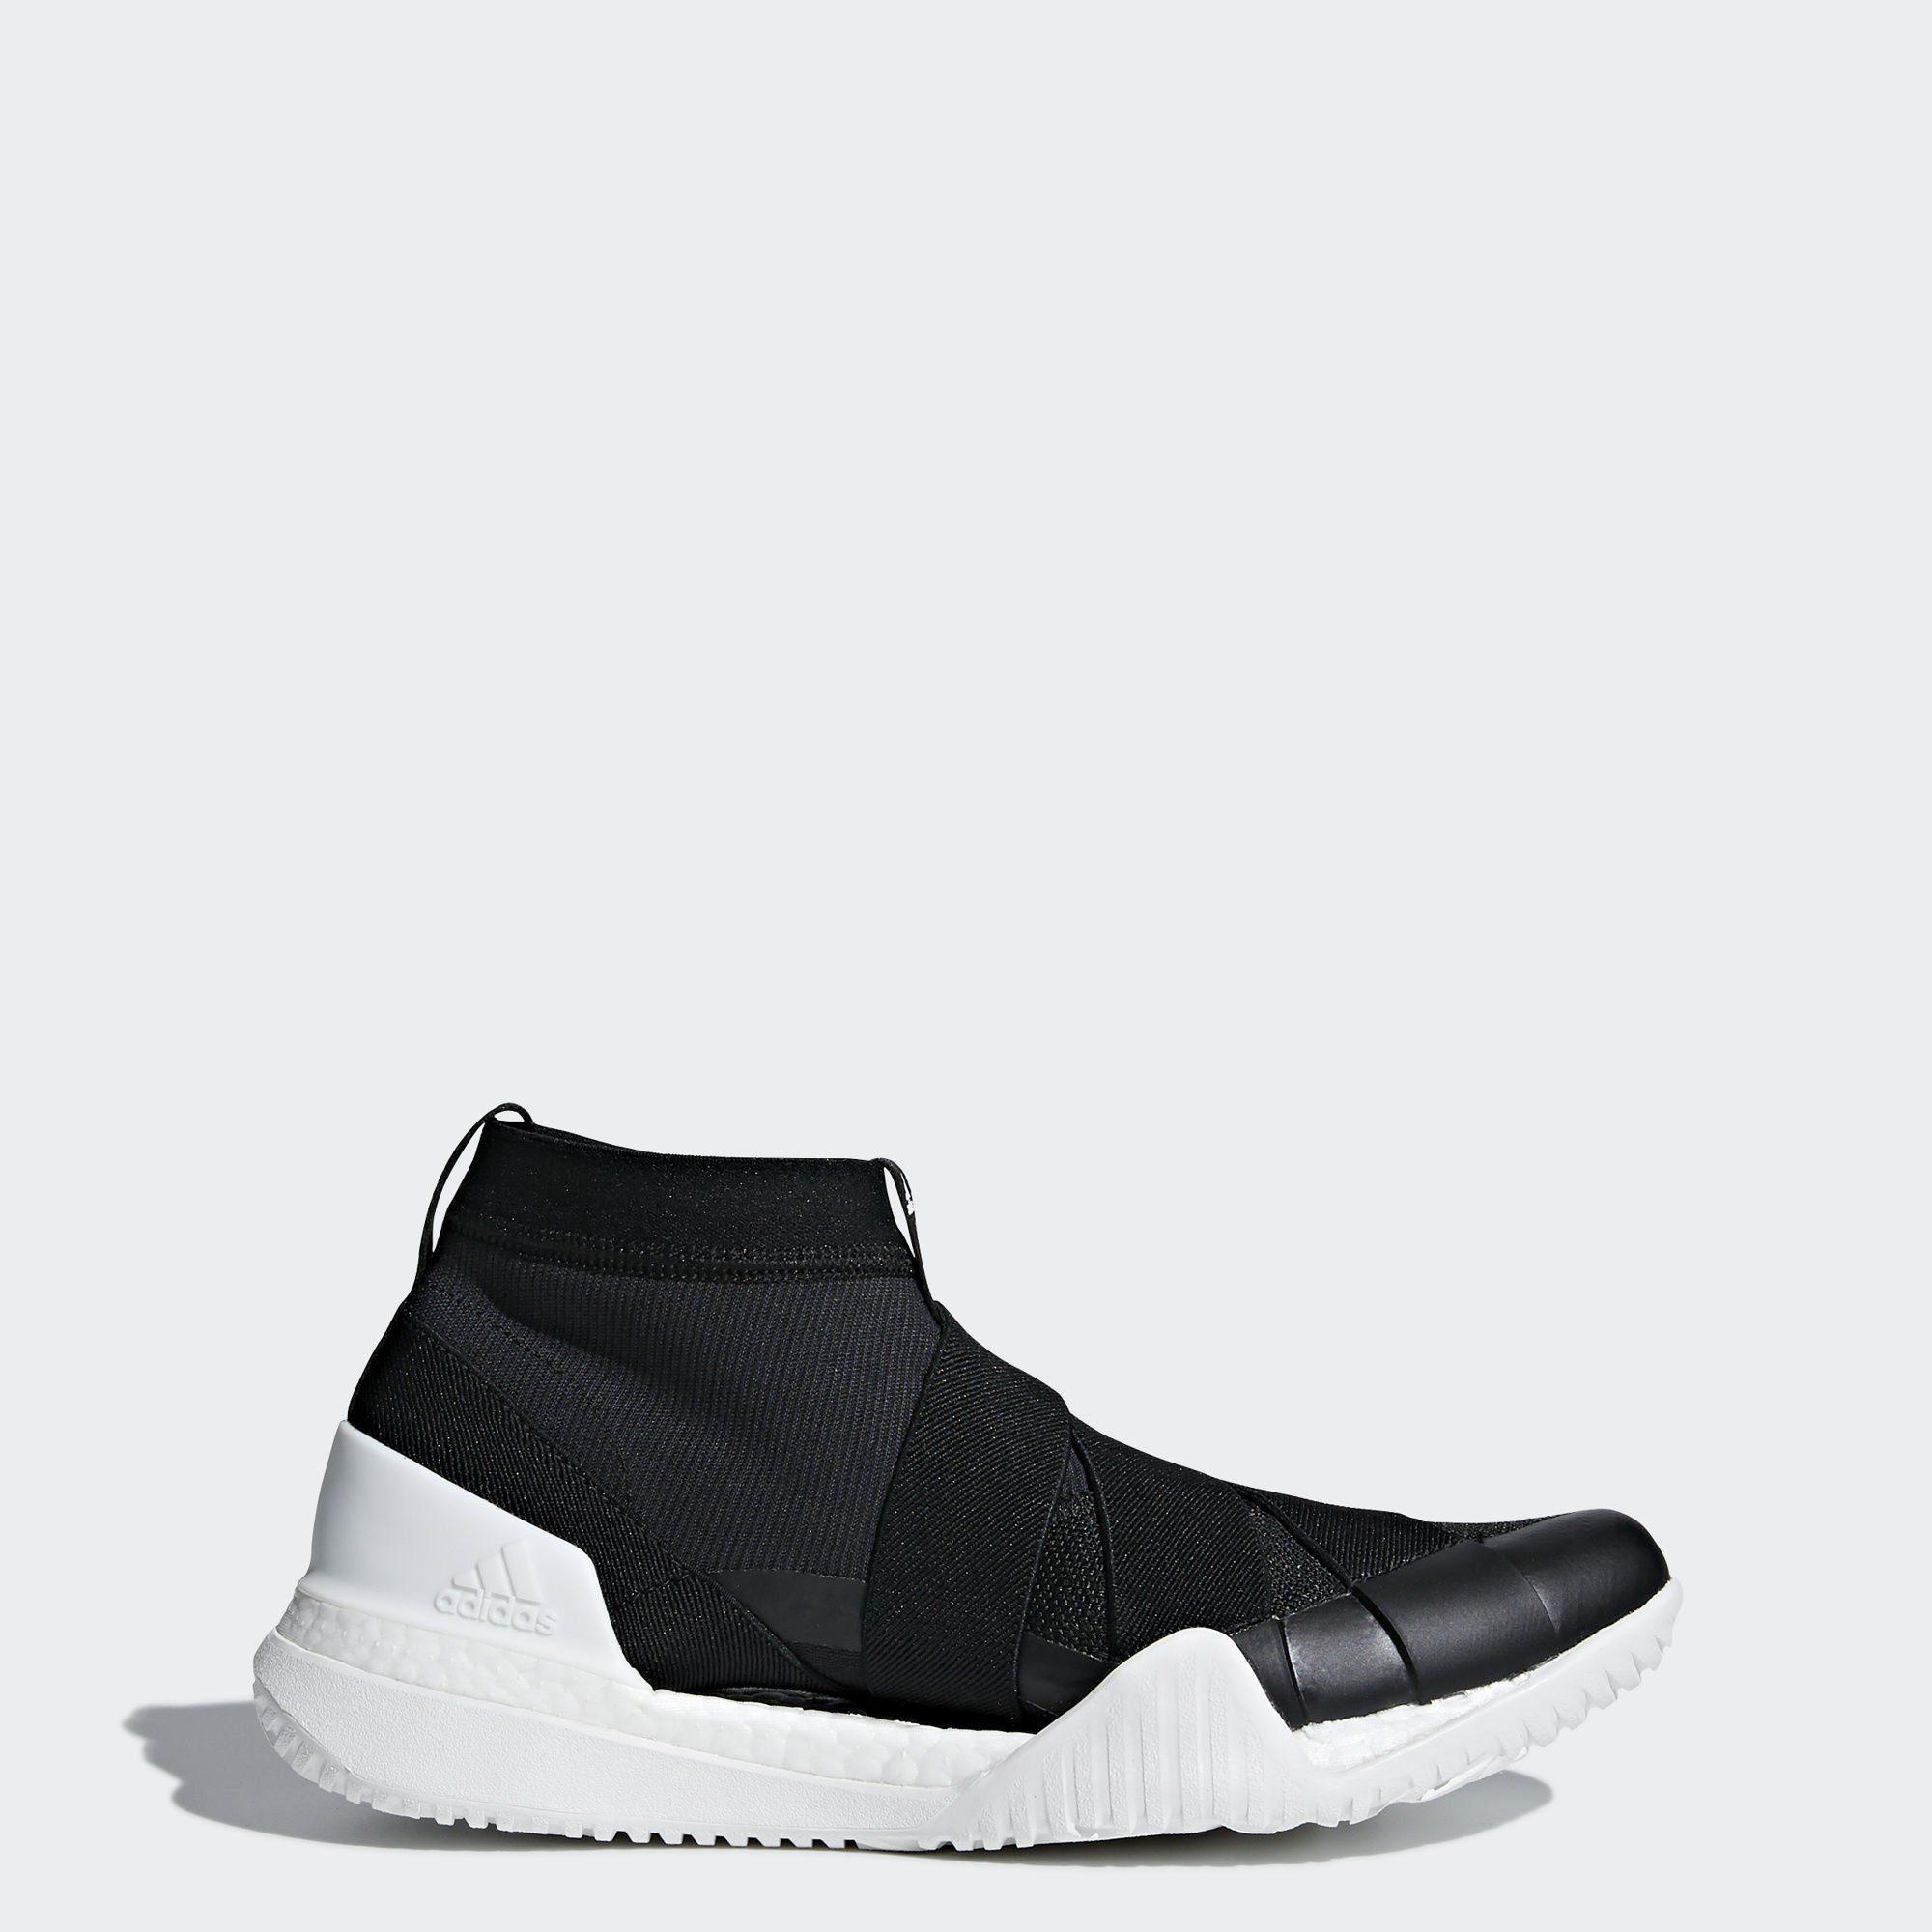 adidas Performance PureBOOST X TR 30 LL Schuh Trainingsschuh online kaufen  black